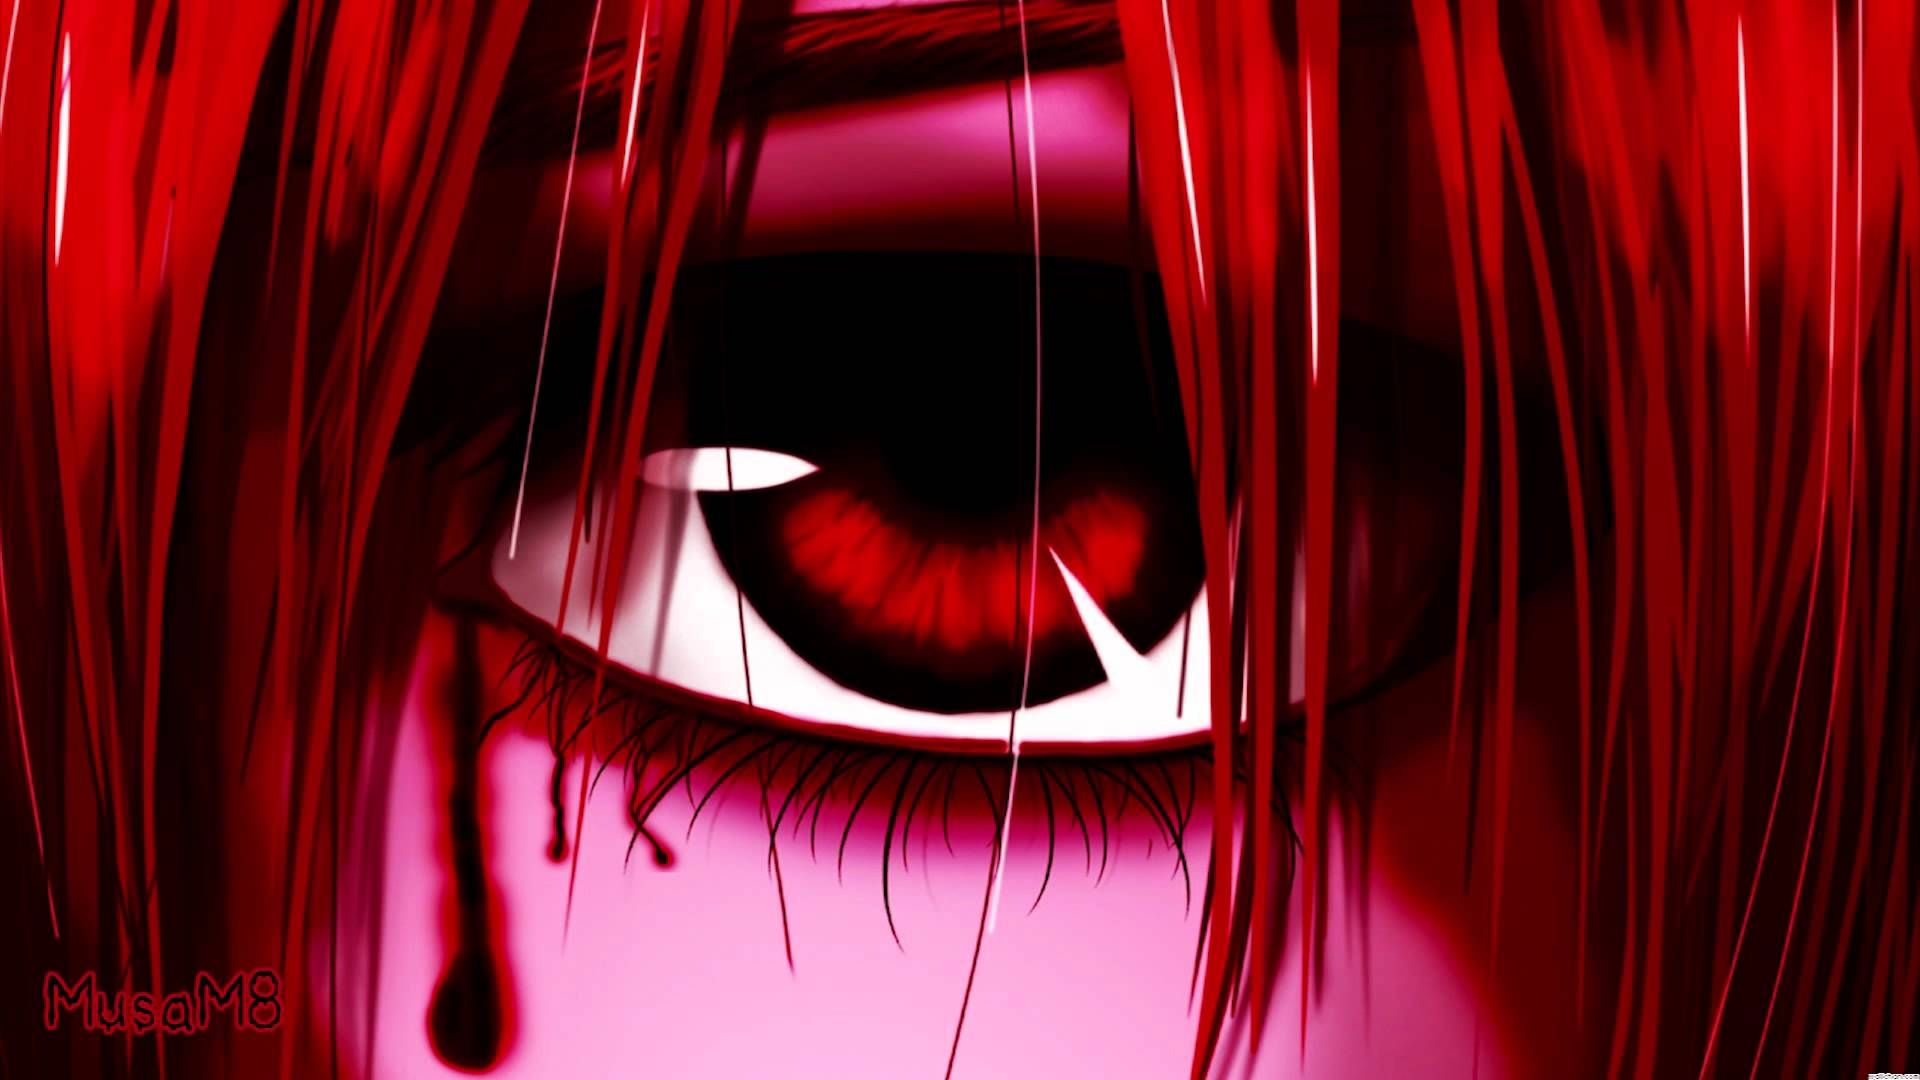 Techno Lilium Hd Anime Wallpapers Anime Wallpaper Elfen Lied